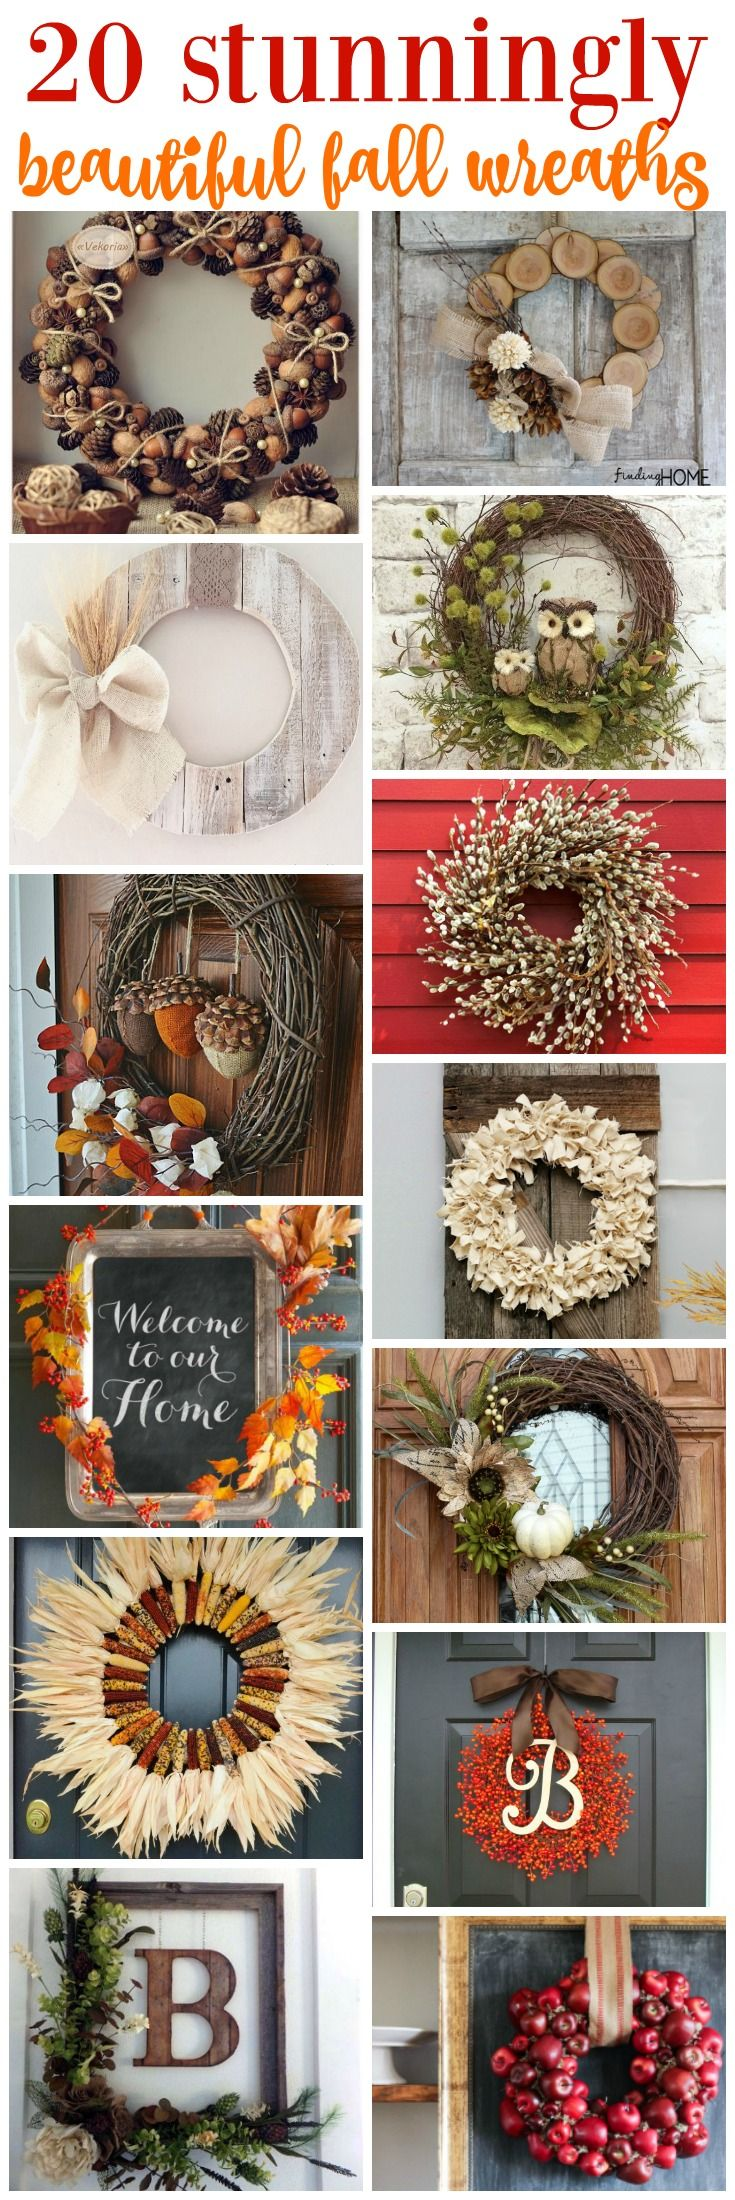 20-stunningly-beautiful-fall-wreaths